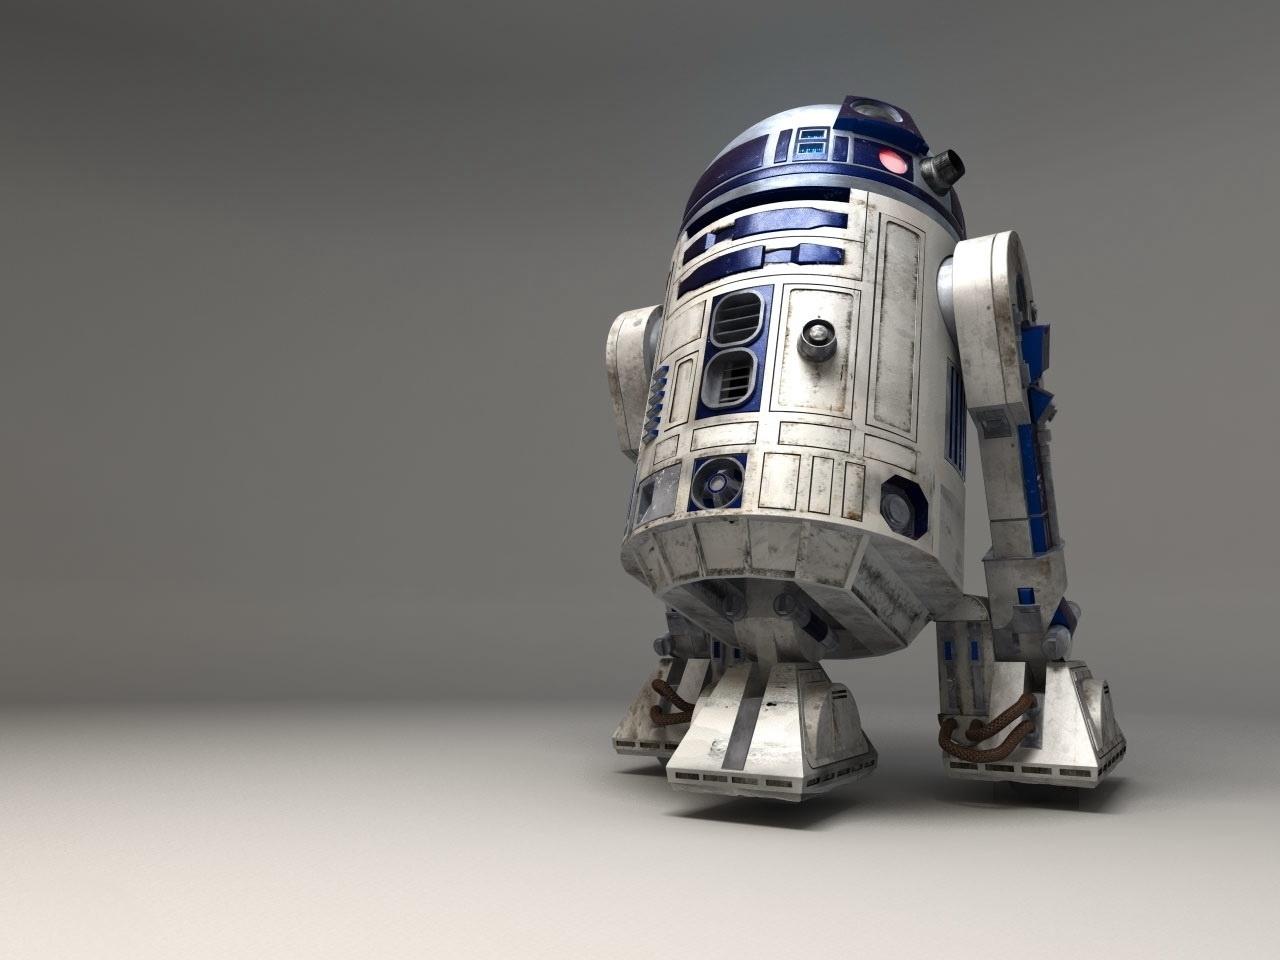 kino roboty zvezdnye vojny star wars 25148 - Детский день рождения